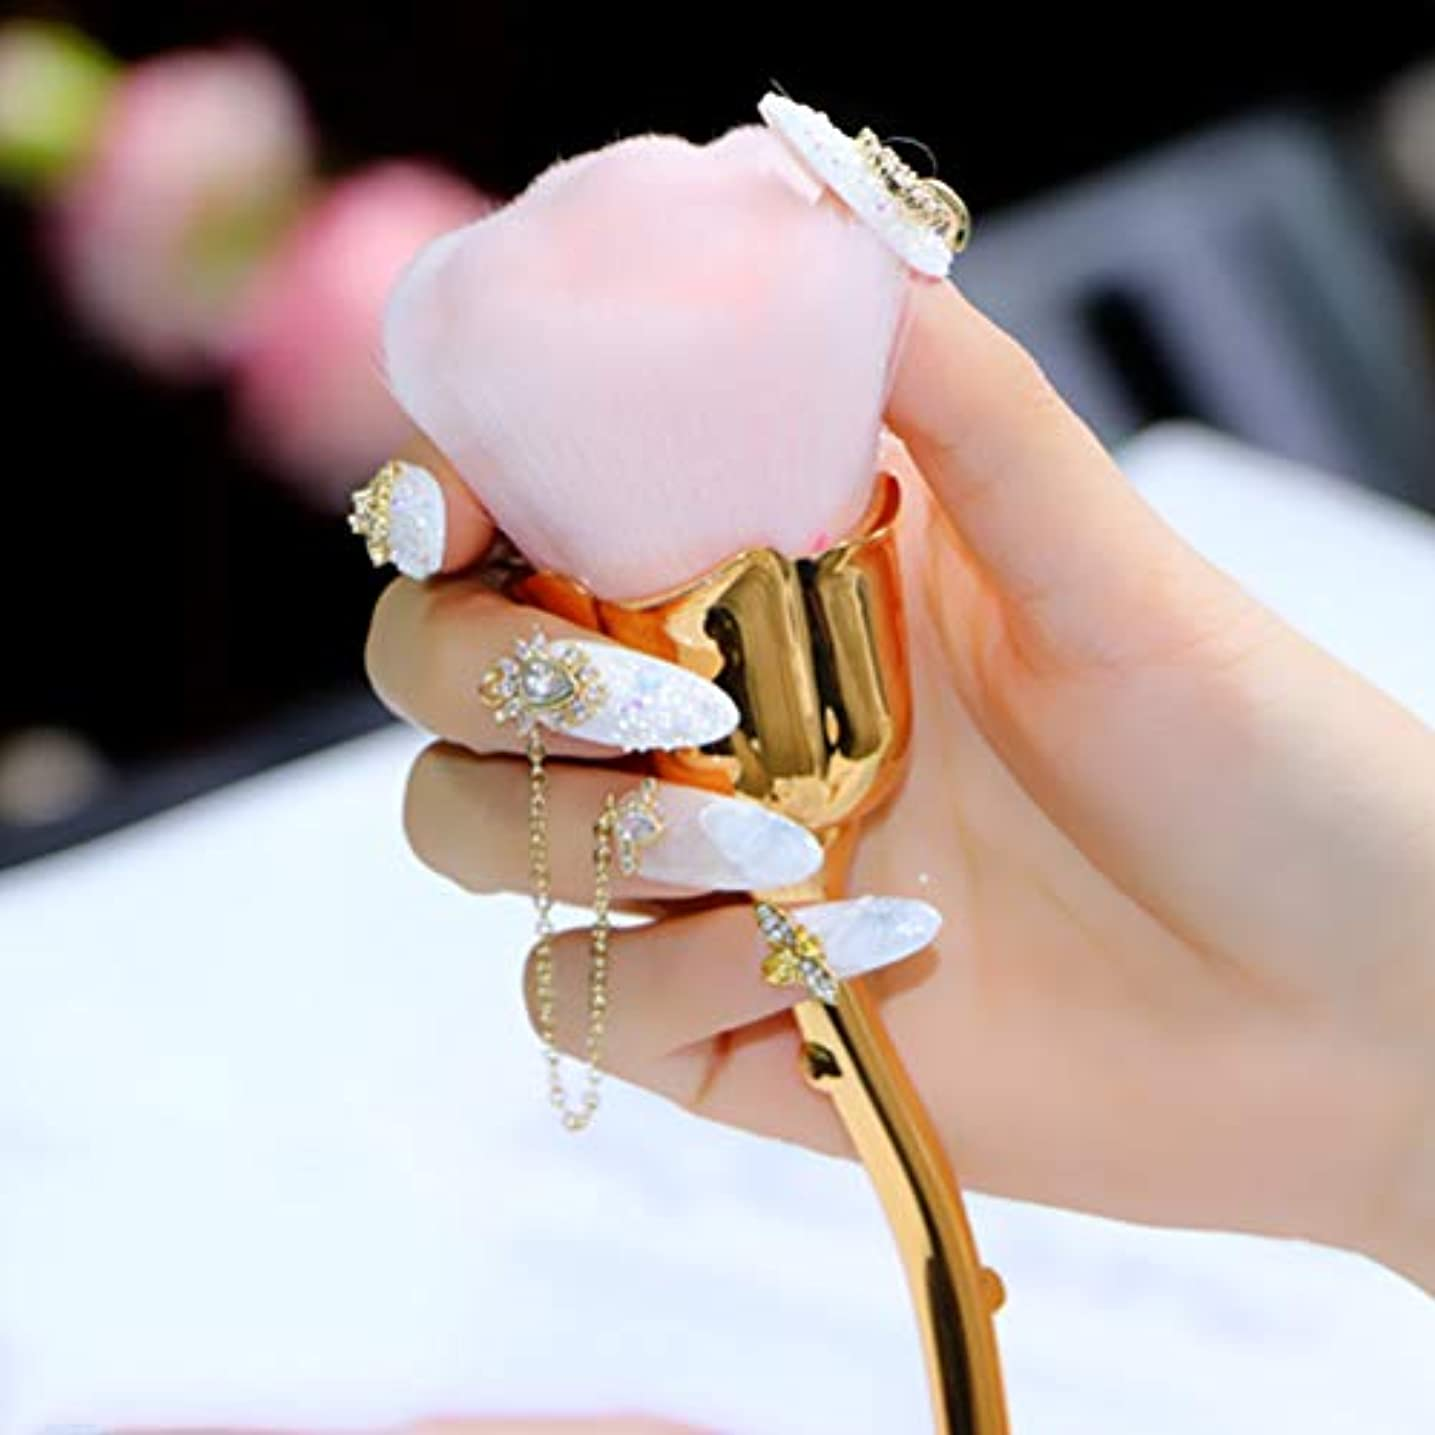 Daimai 化粧ブラシ ネイルダストブラシ ピンク バラ花 ブラッシュブラシ ネイルダストブラシ ローズブラシ ネイルアートクリーニングブラシ ブラッシュパウダーブラシ